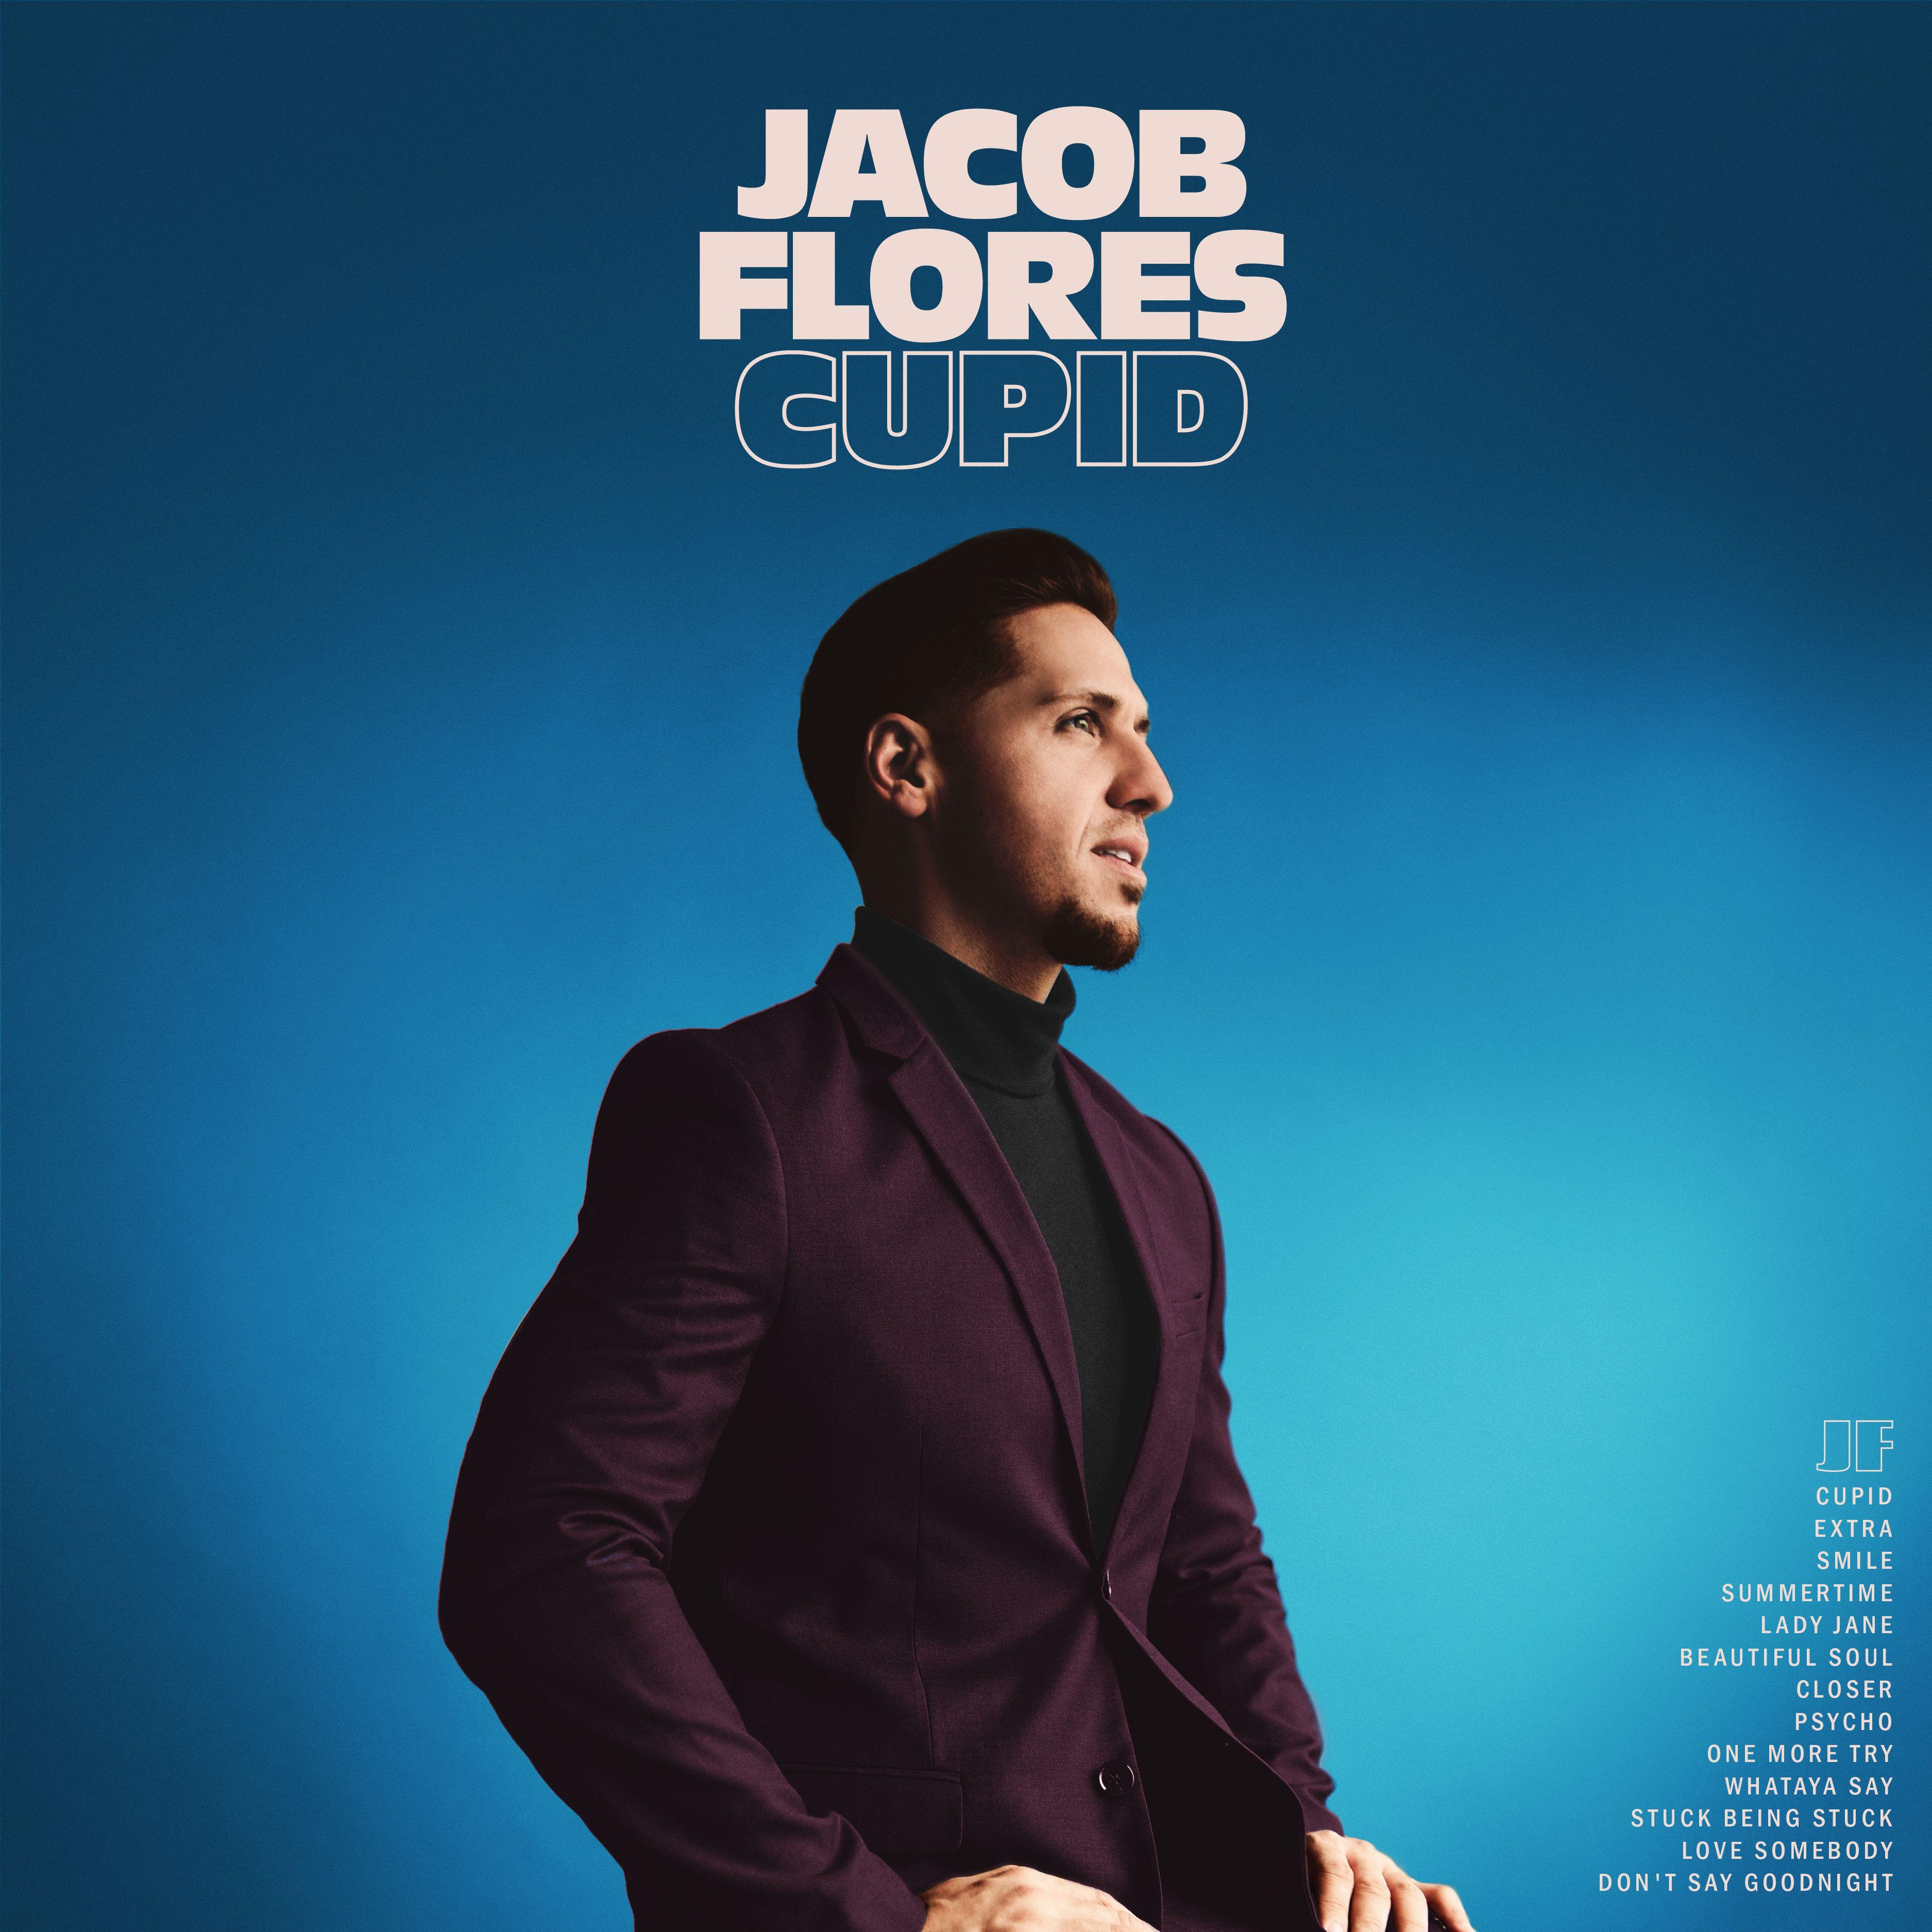 Captivating Classic Soul Rhythms Fused with Enriching Pop Beats: Rising Artist Jacob Flores Unveils New Album